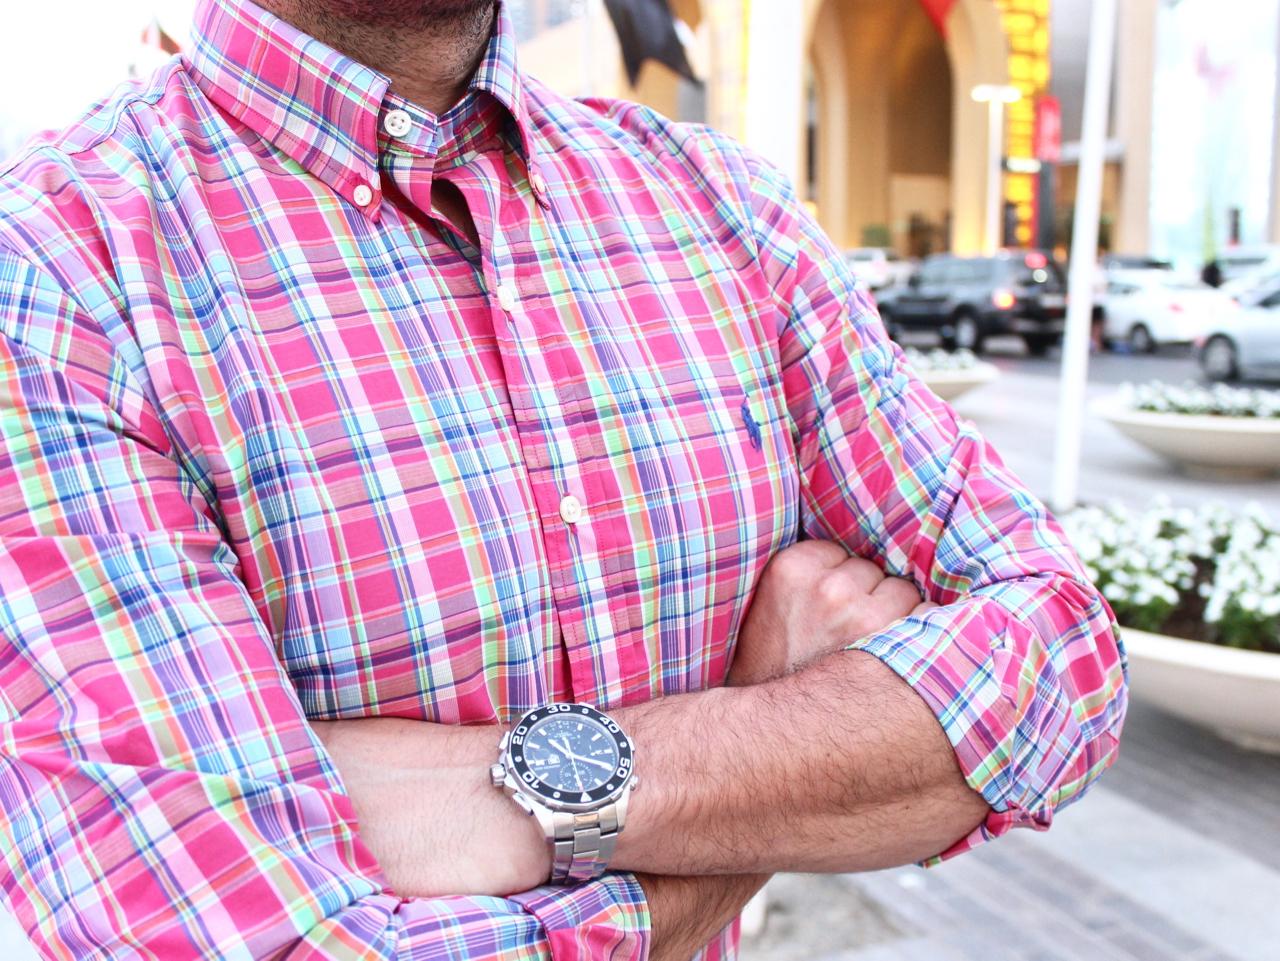 Schneller Downtown Look Dubai UAE VAE Outfit Sommer Summer Fashion Mode Dirk Lifestyle PepperAndGold Zara H&M HundM Boss BossOrange HugoBoss RalphLauren Polo PoloRalphLauren Ralph Lauren Chino Shirt